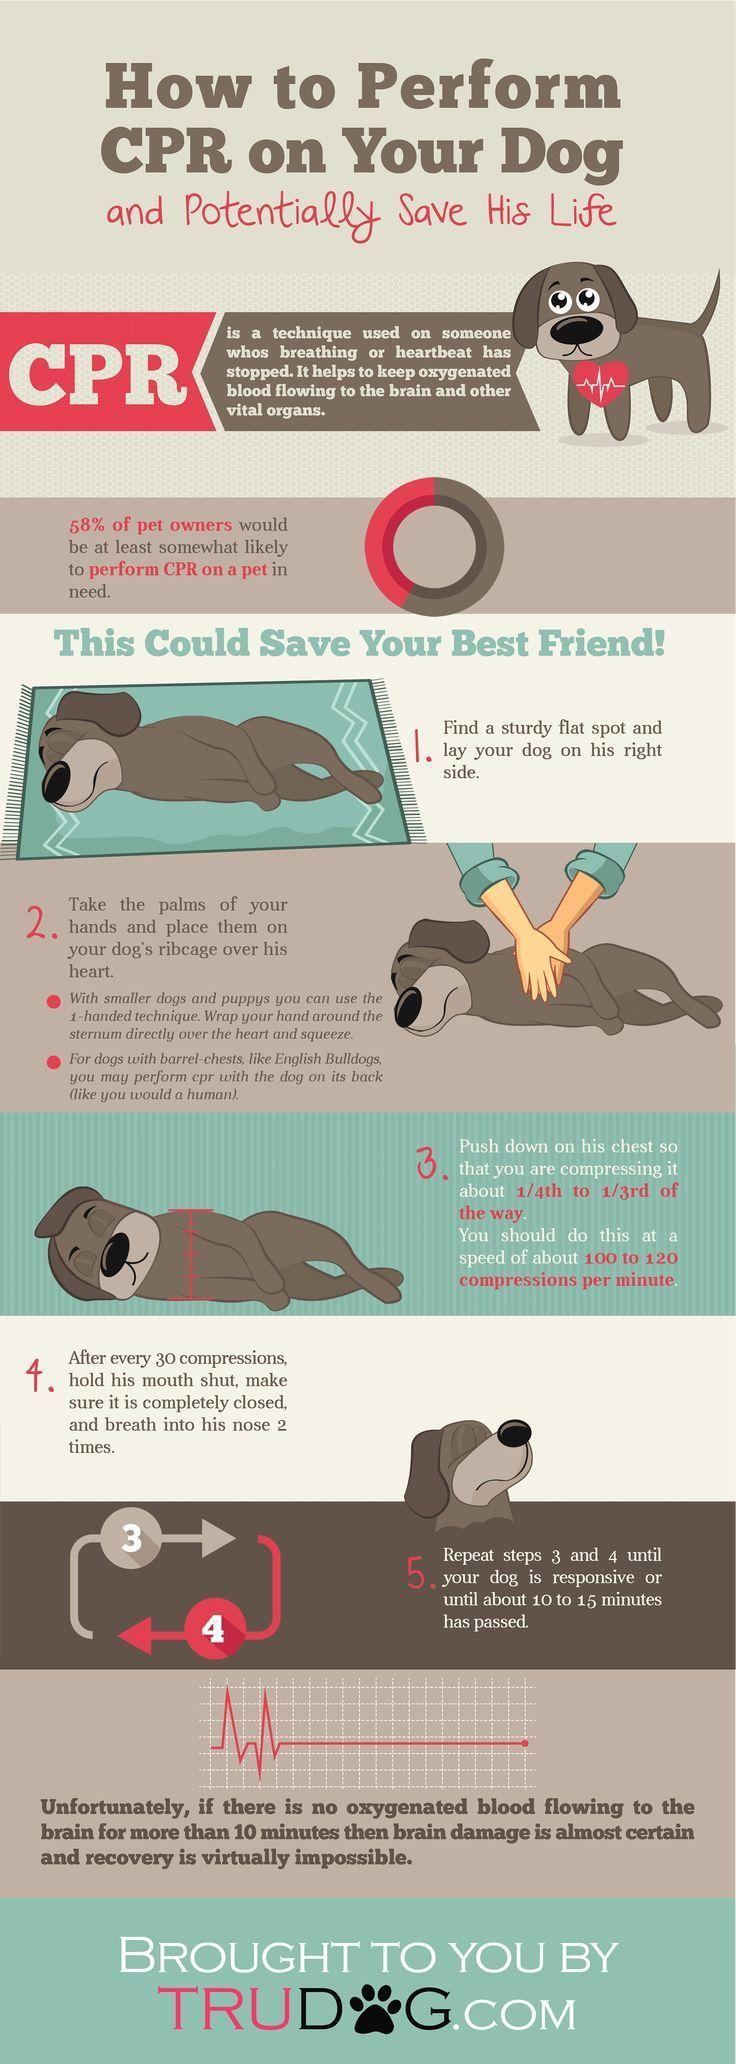 #dog #cprDog CPR